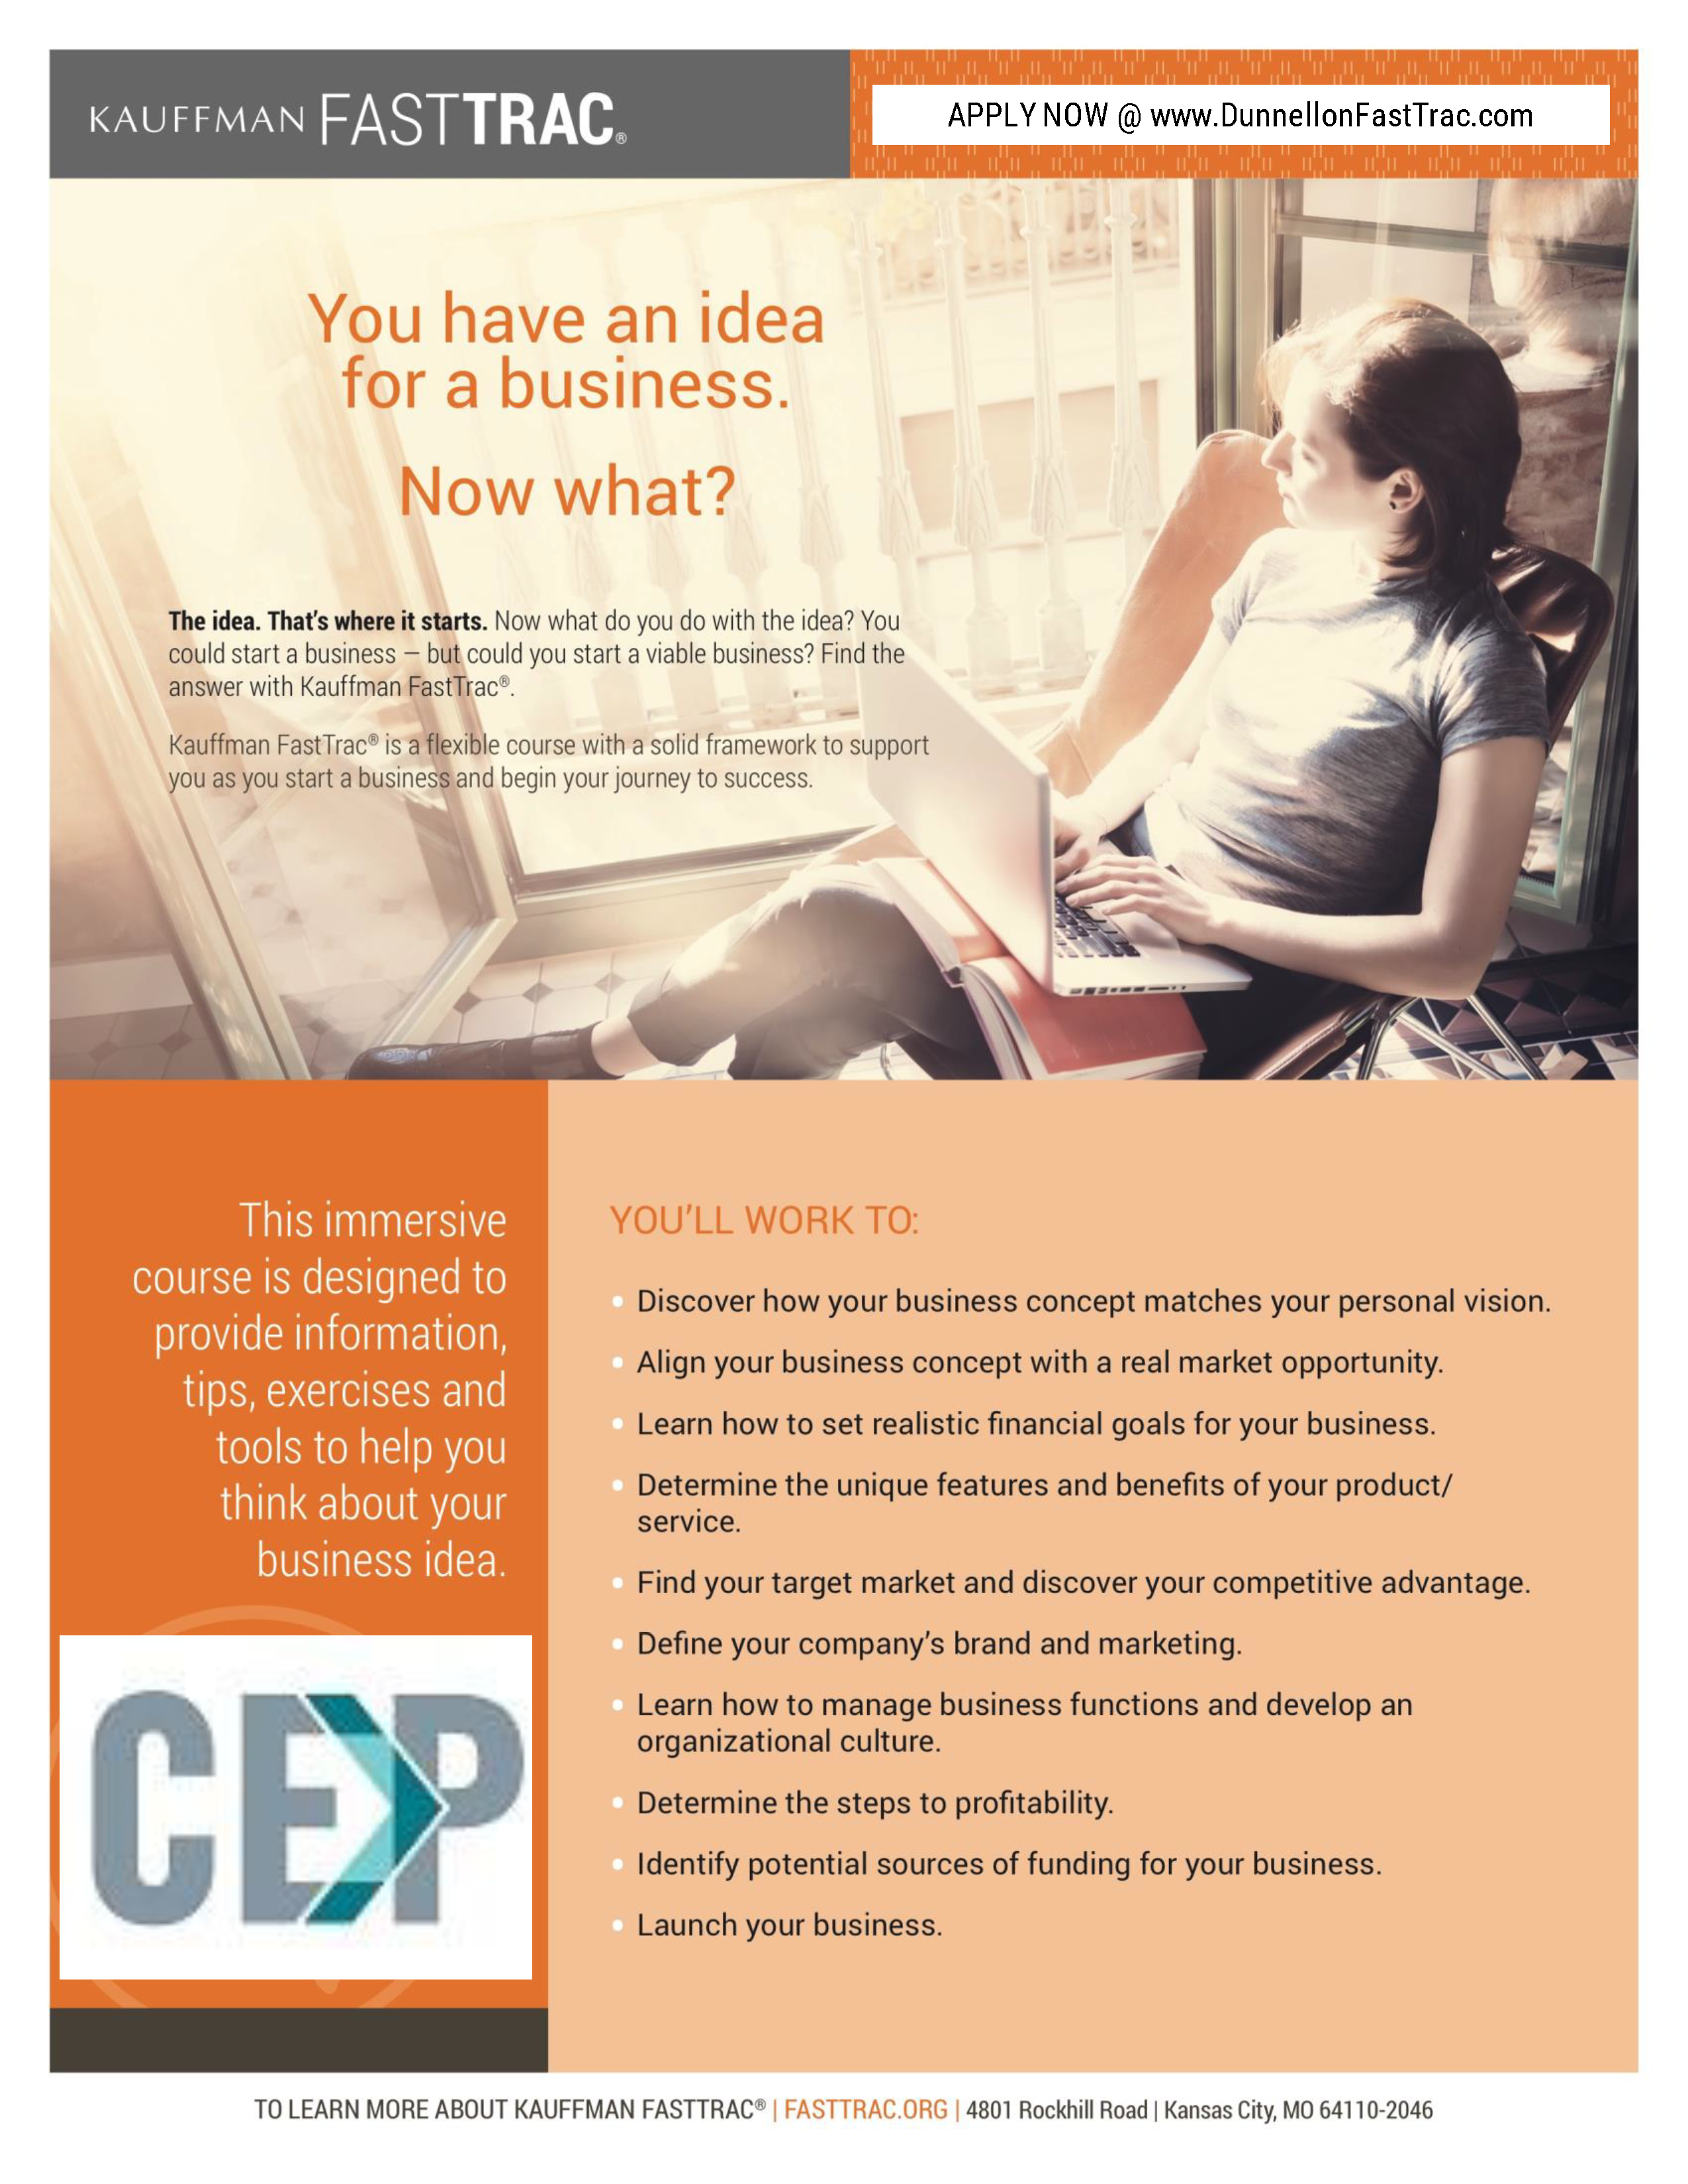 CEP Announces Dunnellon FastTrac Program Beginning in August